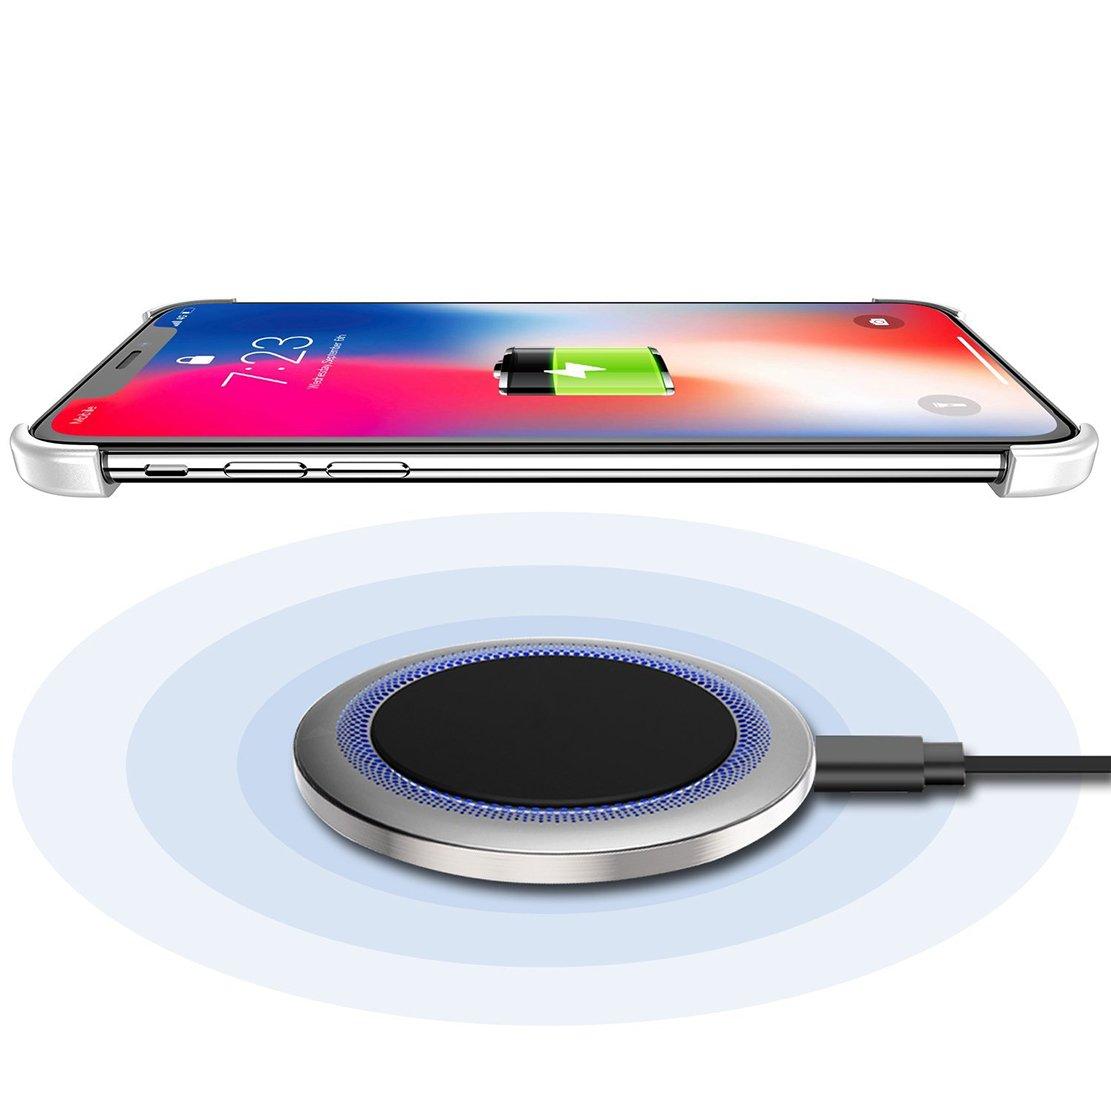 297c1a7ce85 seabaras iPhone X funda Bumper Ultra Thin Apple iPhone en forma de X  Protectores de Funda Bumper funda aluminio marco de metal soporte para  iPhone de carga ...